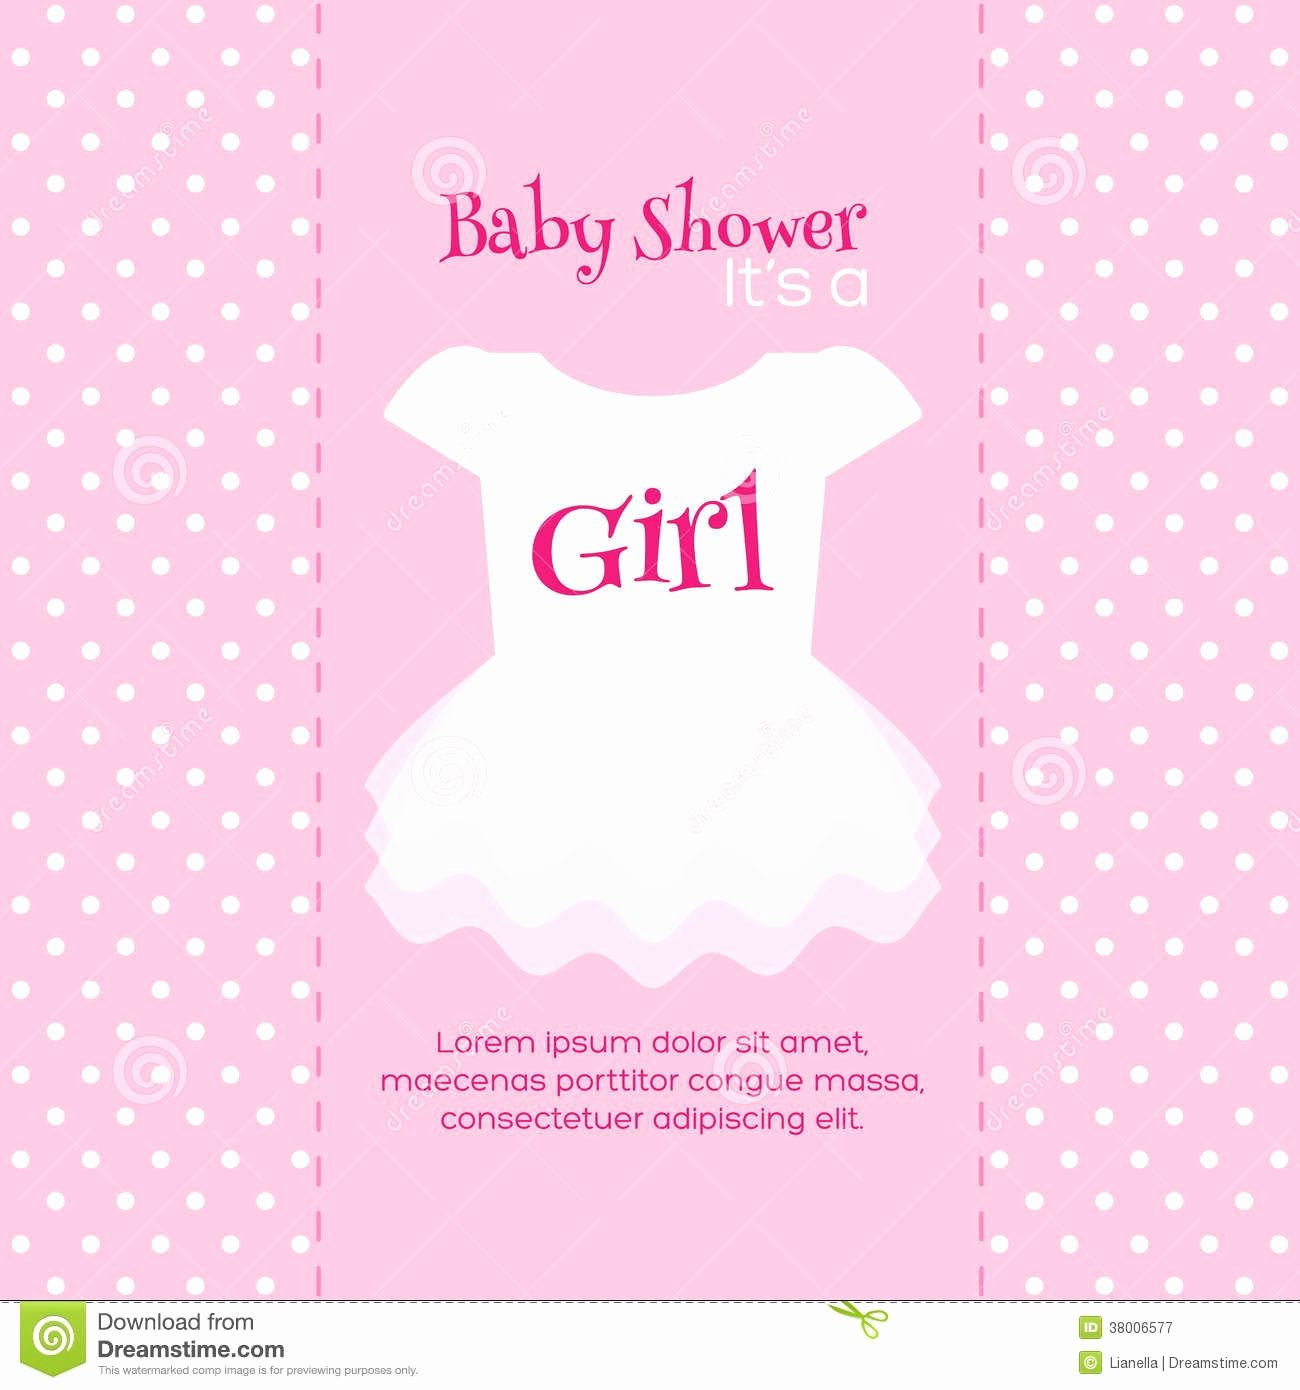 Baby Shower Invite Template Fresh Design Free Printable Baby Shower Invitations for Girls